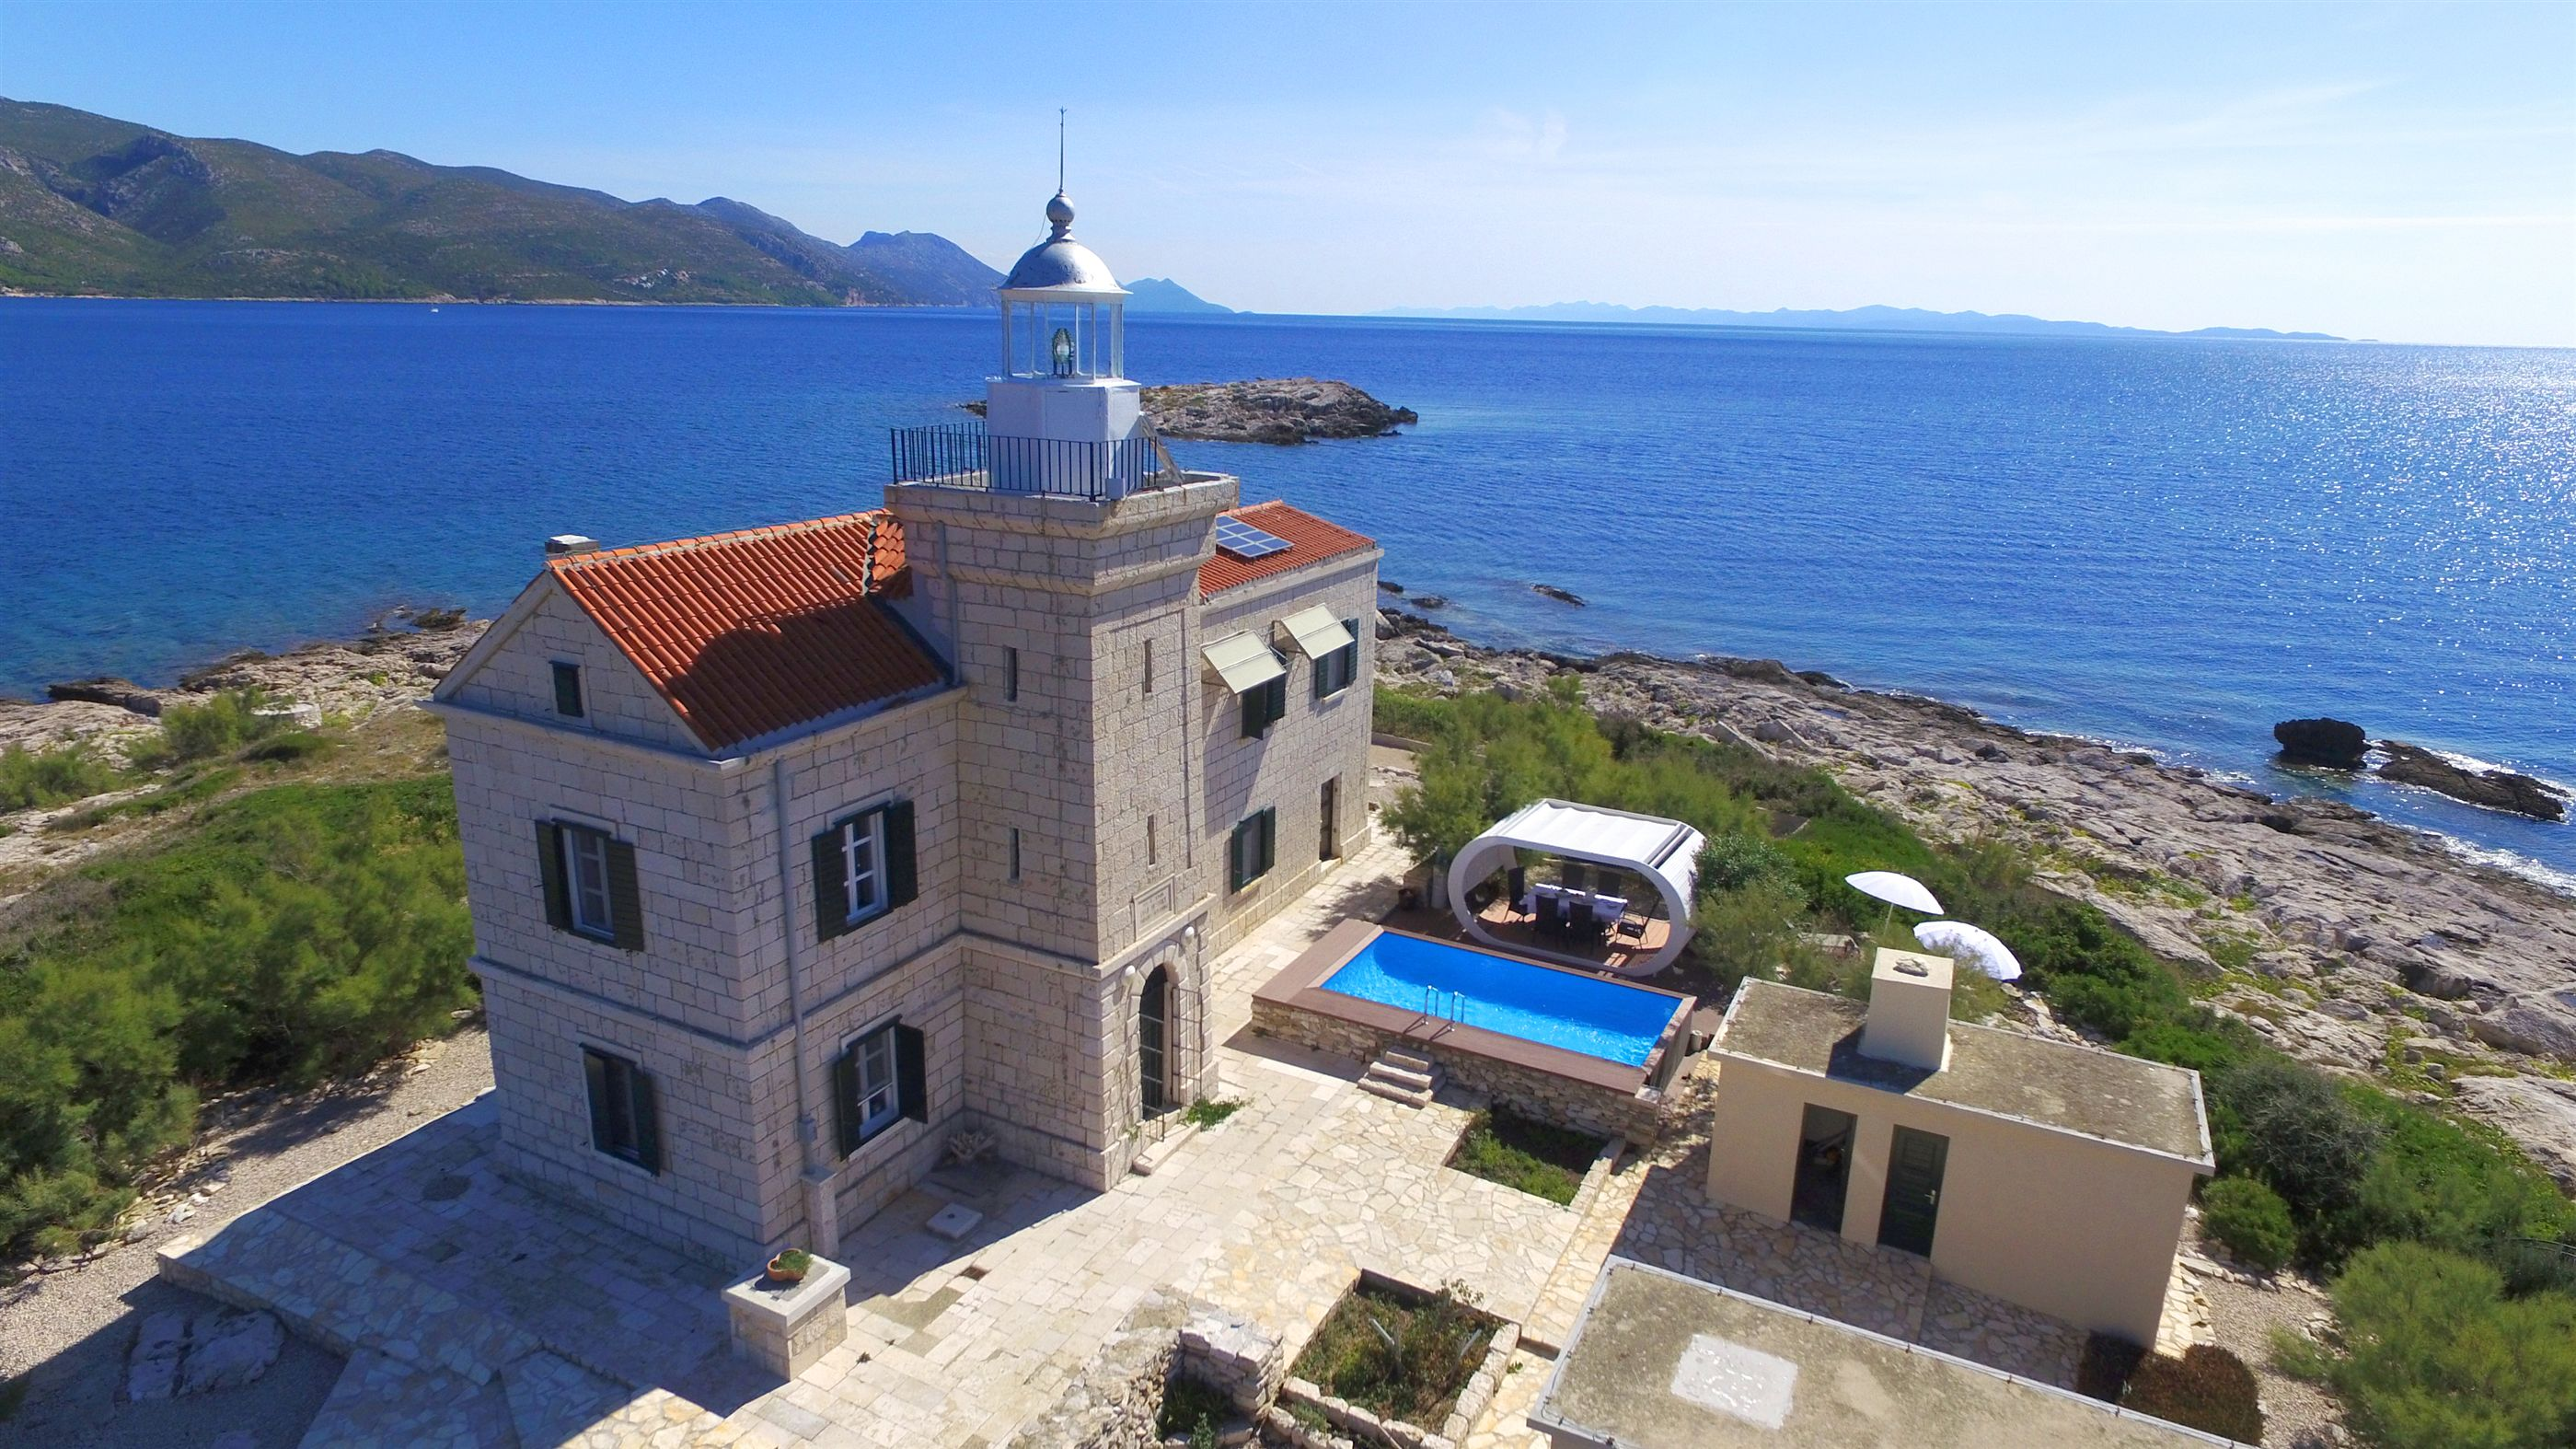 villa lighthouse korkyra island korcula